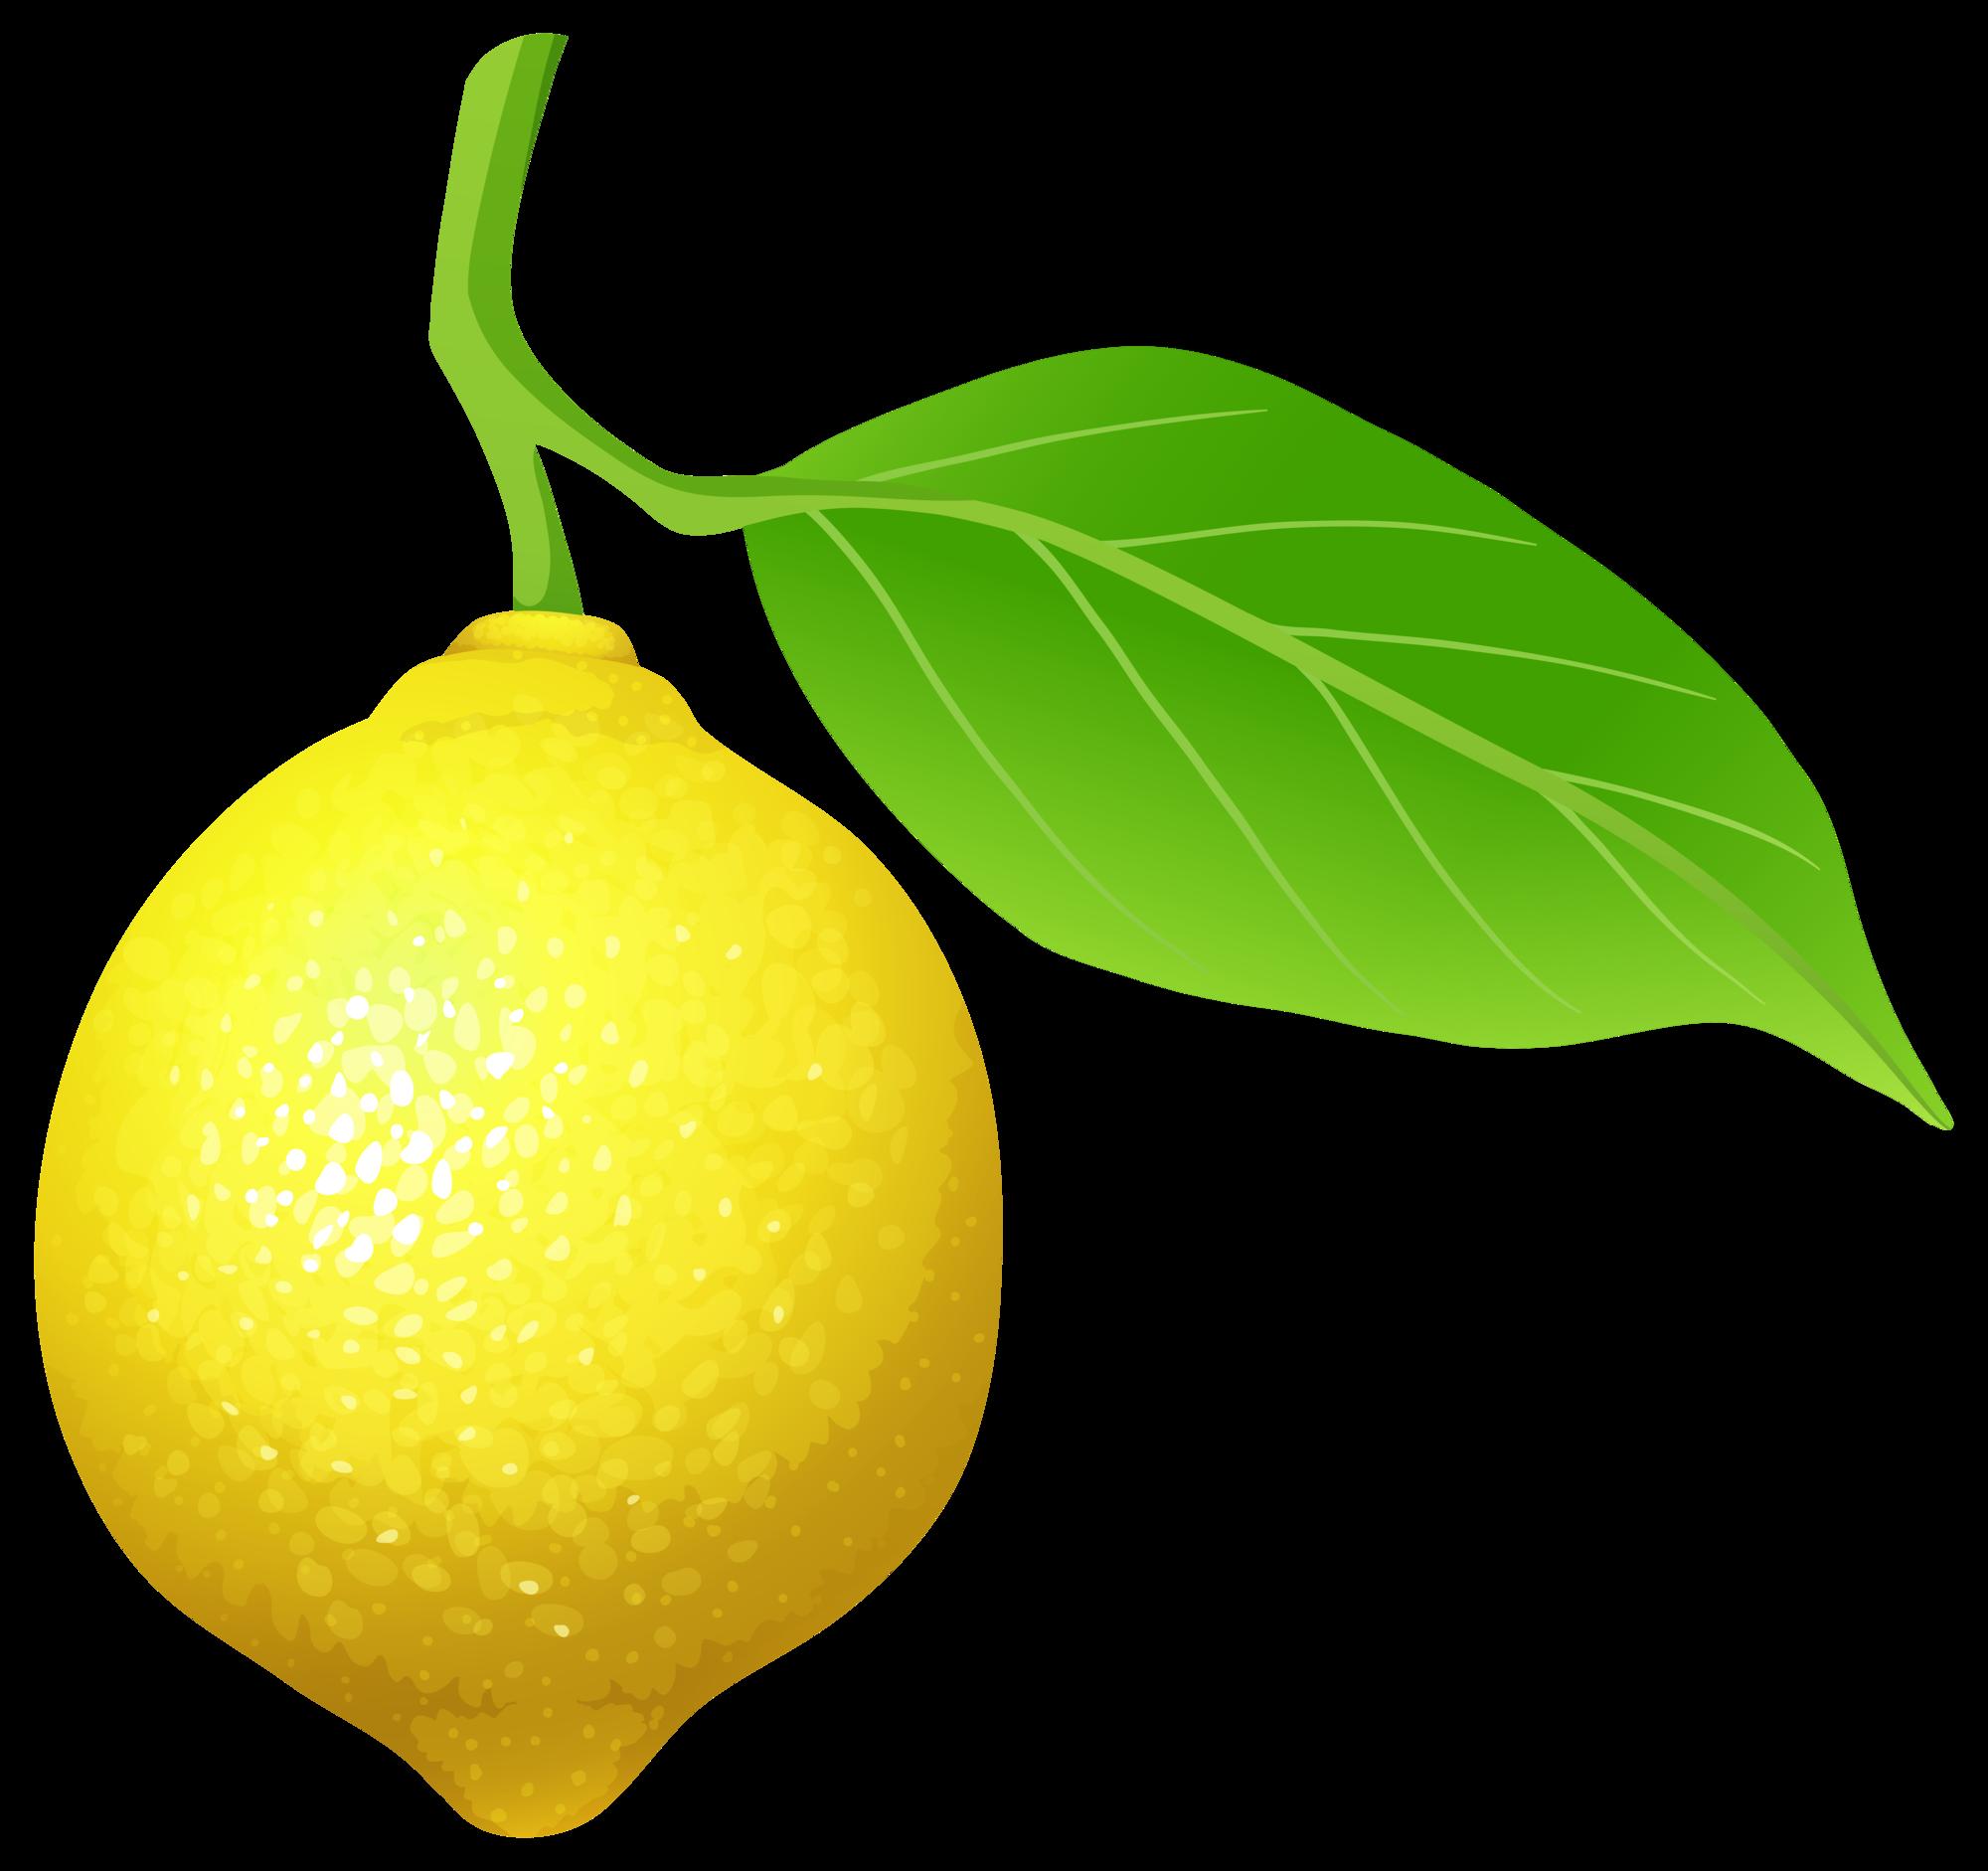 freeuse download Lime green lemon free. Lemons clipart